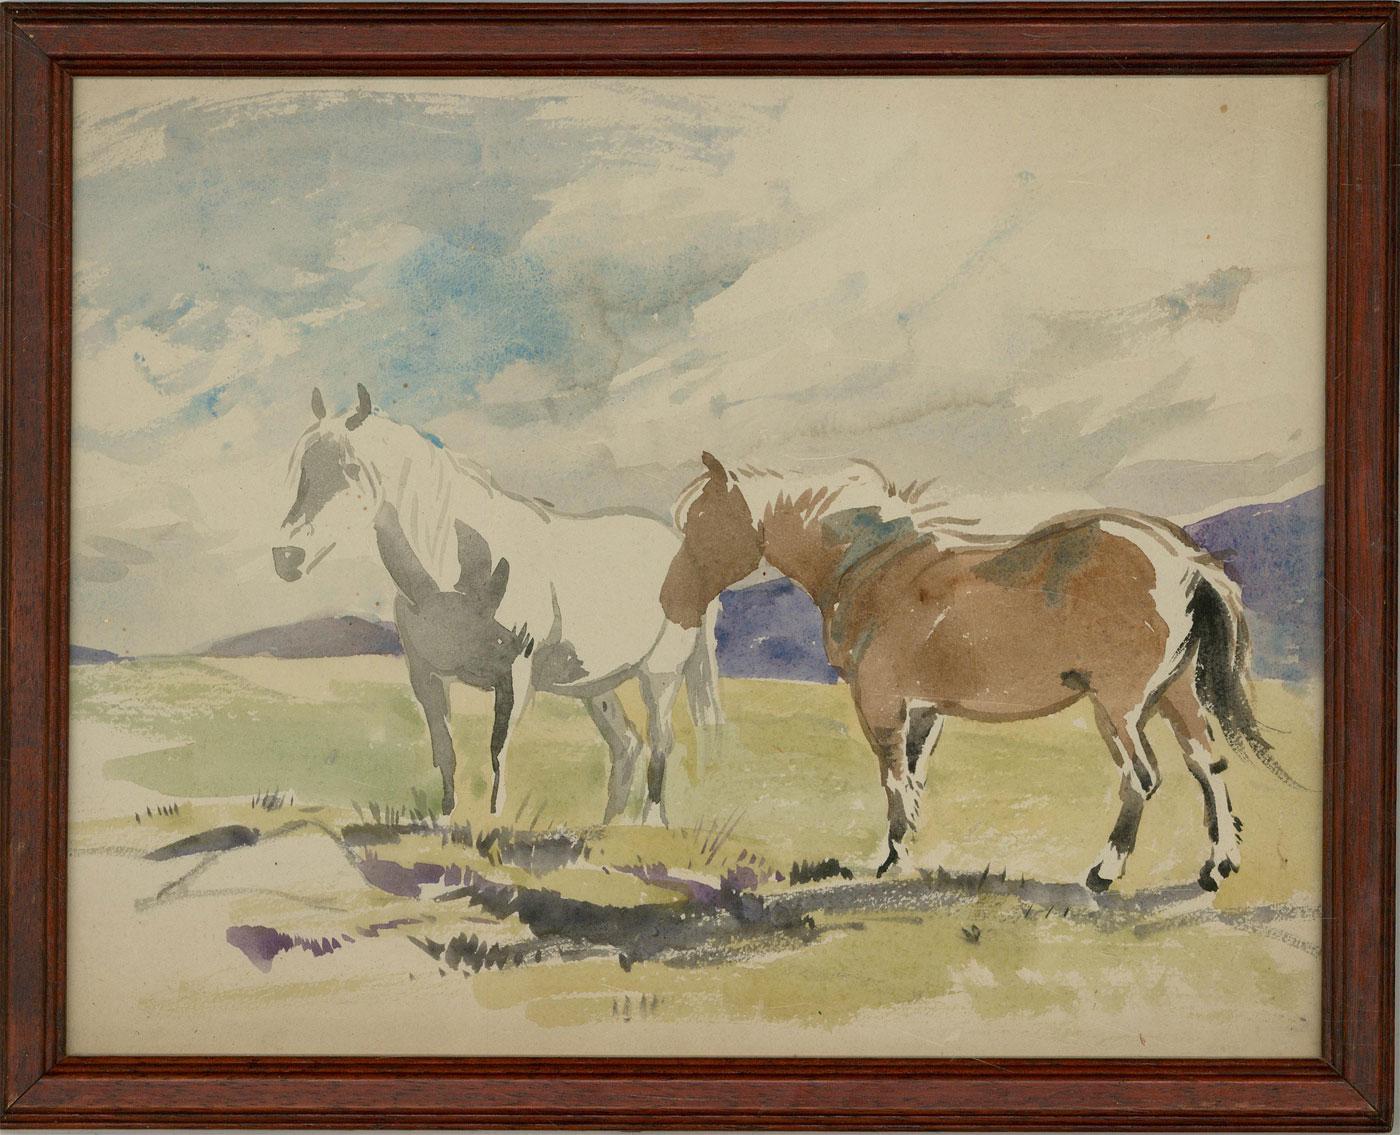 Attrib. John Murray Thomson (1885-1974) - Early 20th Century Watercolour, Horses